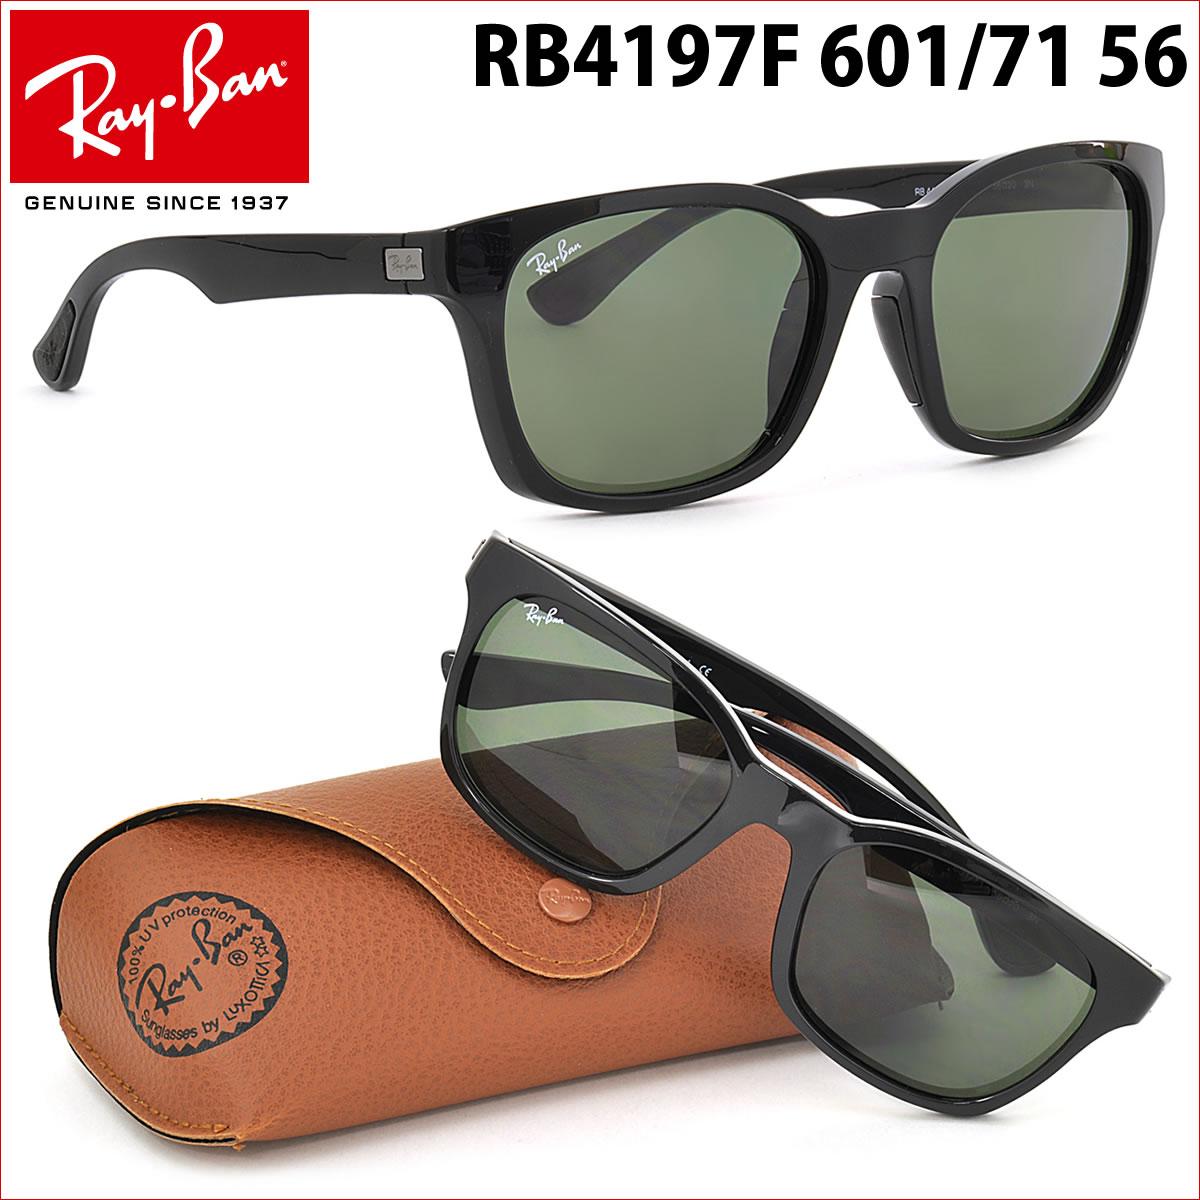 f9d763cbf14c2  楽天市場 レイバン サングラス Ray-Ban RB4197F 601 71 56サイズレイバン